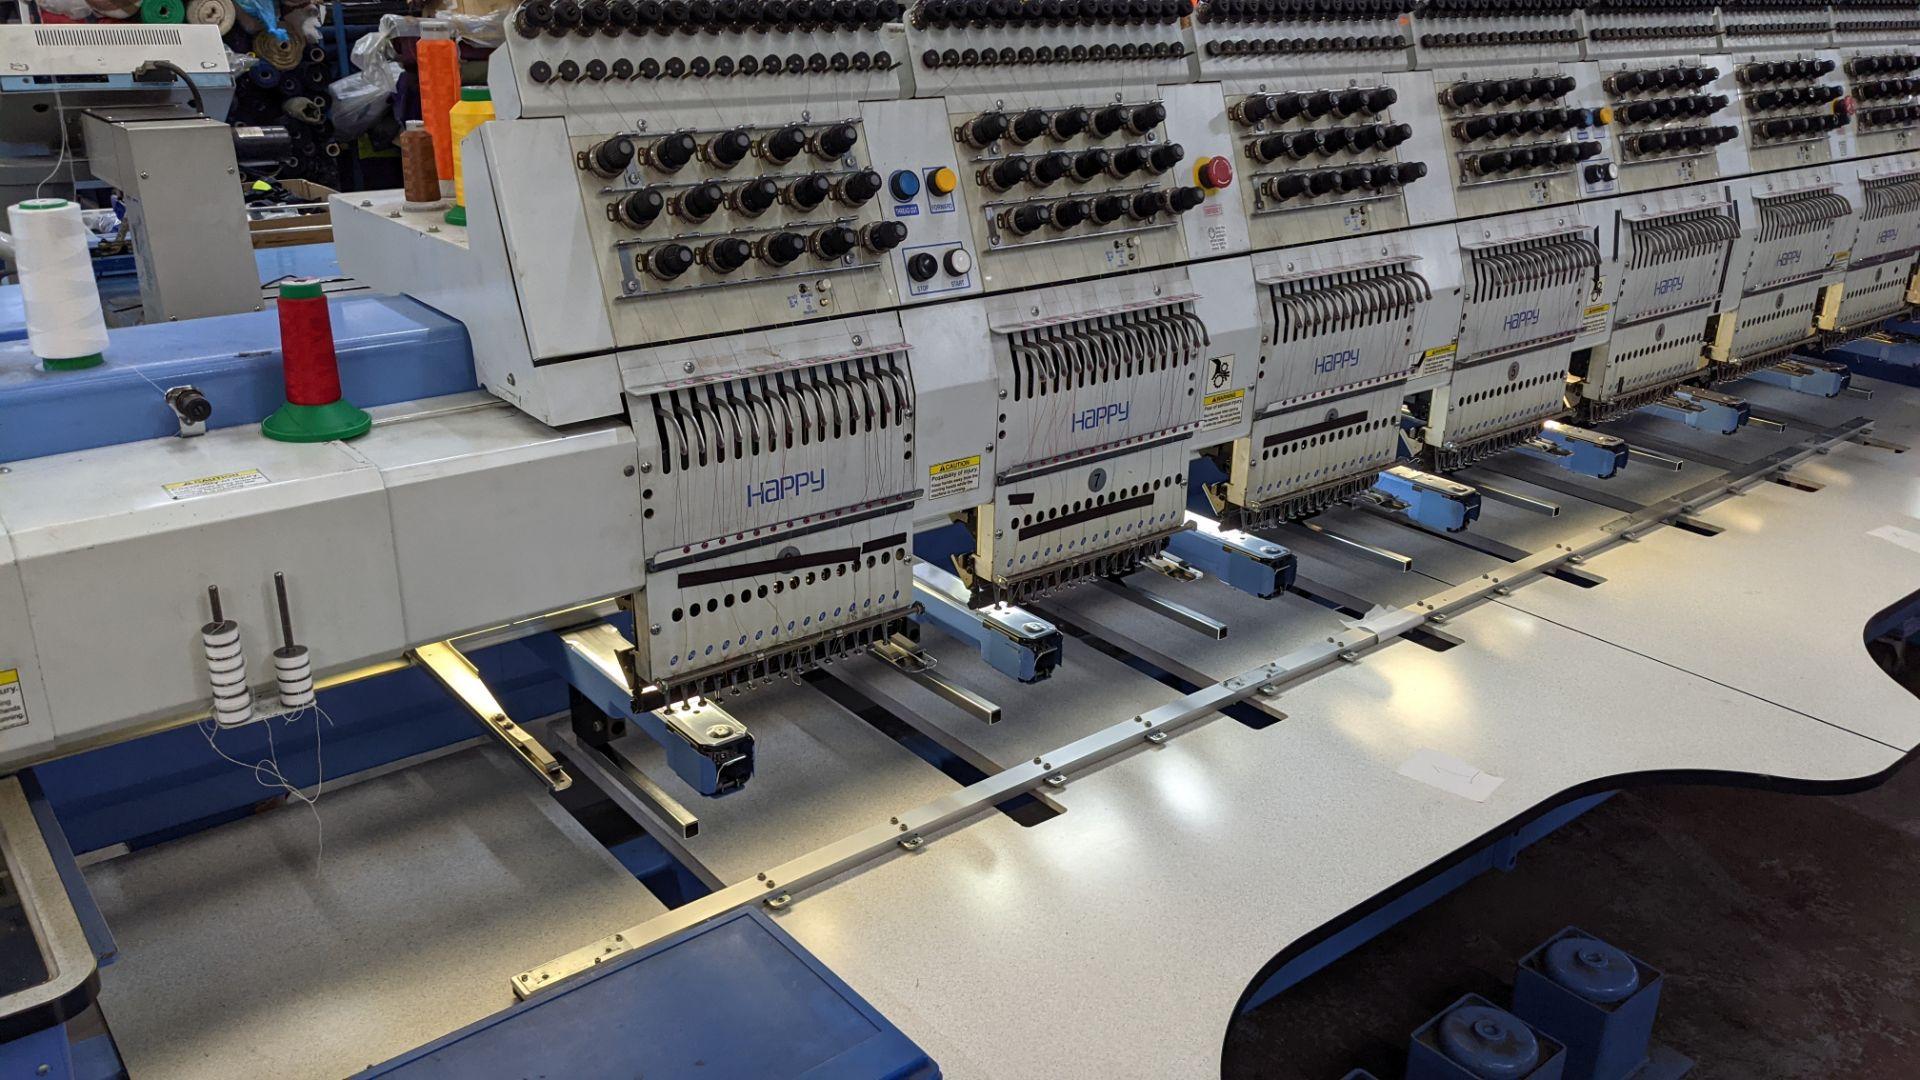 Happy 8 head embroidery machine, model HCG-1508B-45TTC, 15 needles per head, including frames & othe - Image 6 of 32